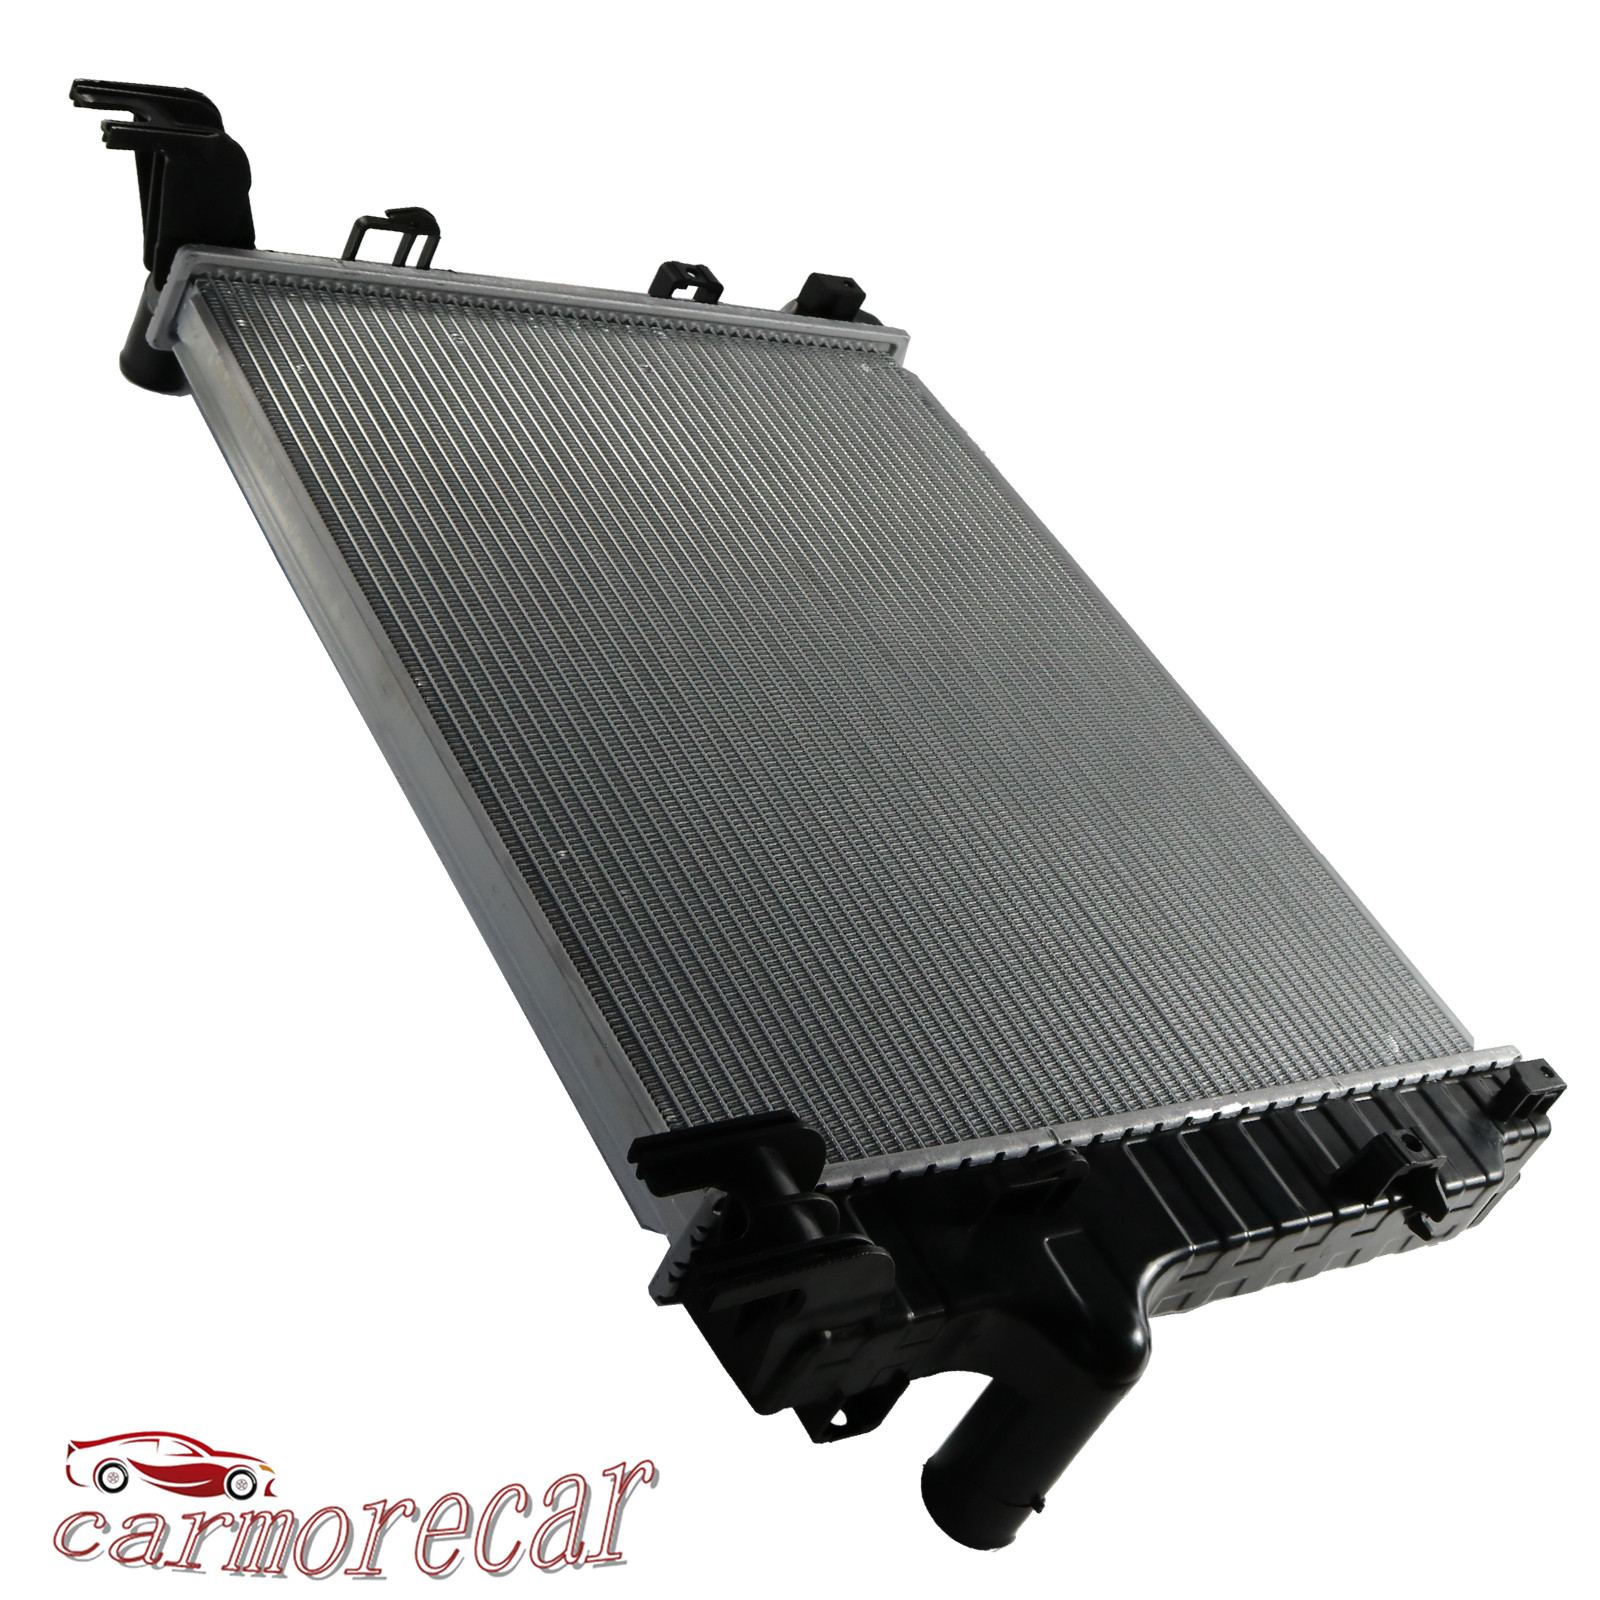 52028816AD 52028818AB Radiator For Dodge Dakota 4.7 2.5 3